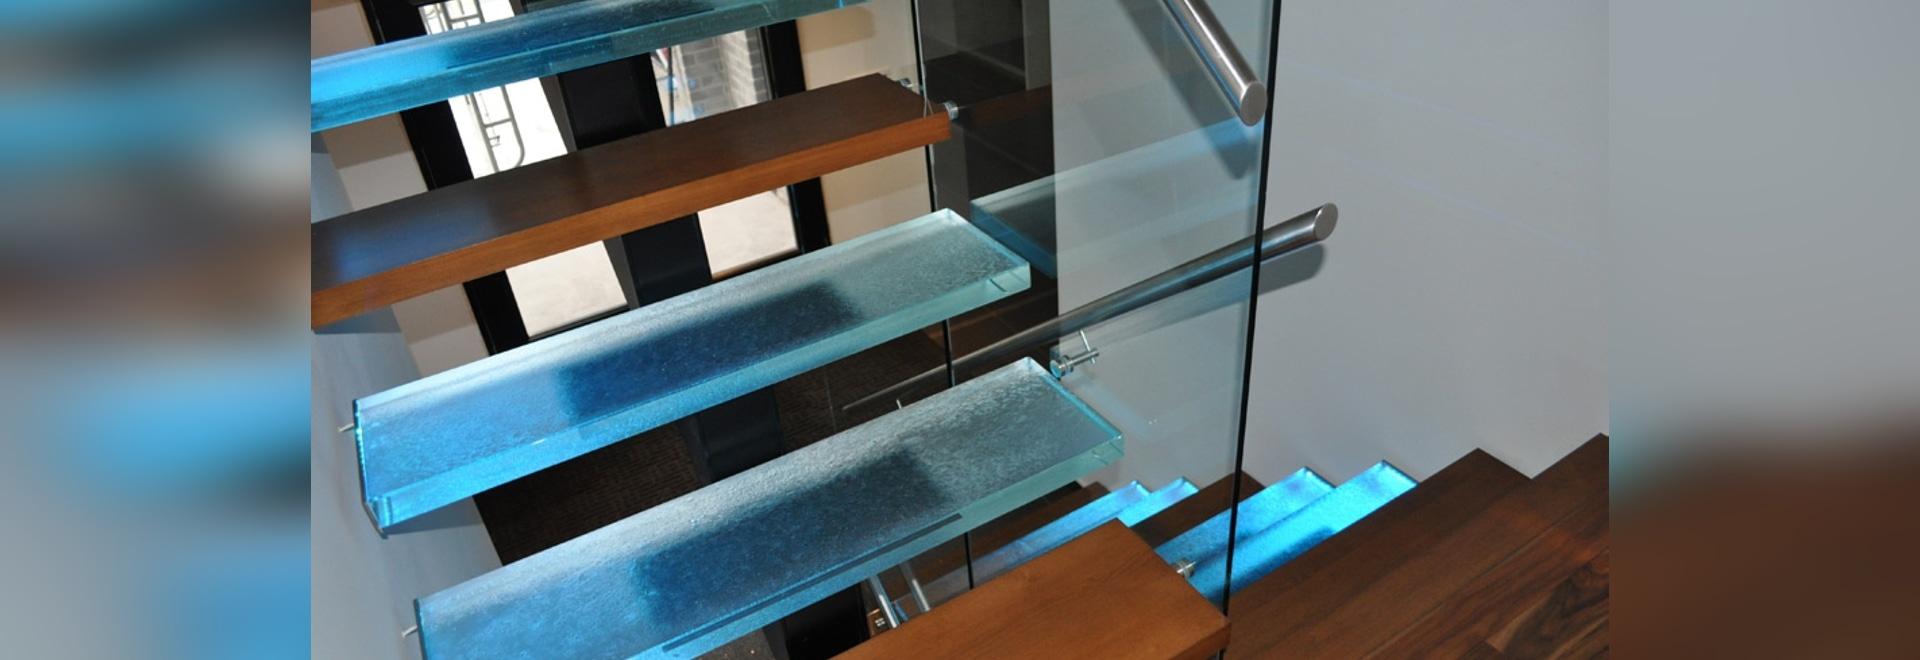 Thinkglass Glass treads